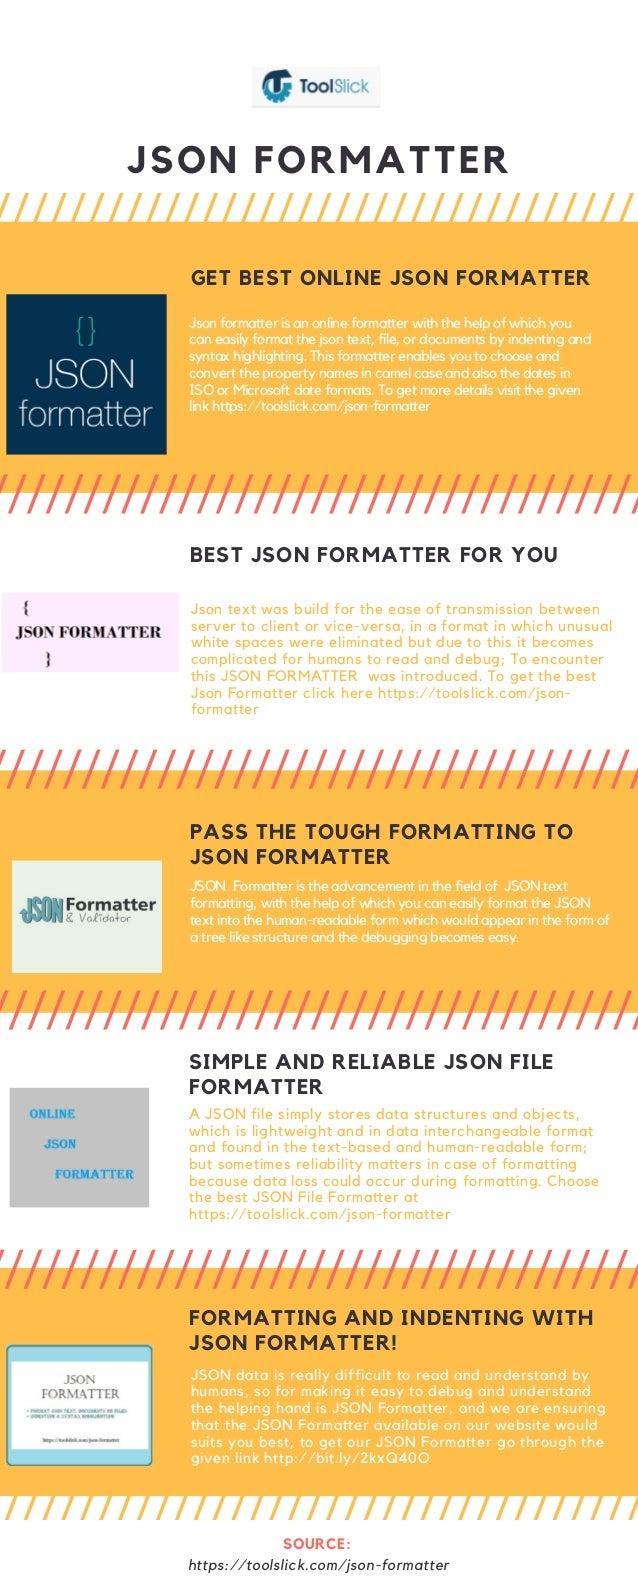 Best json formatter keeps you updated!